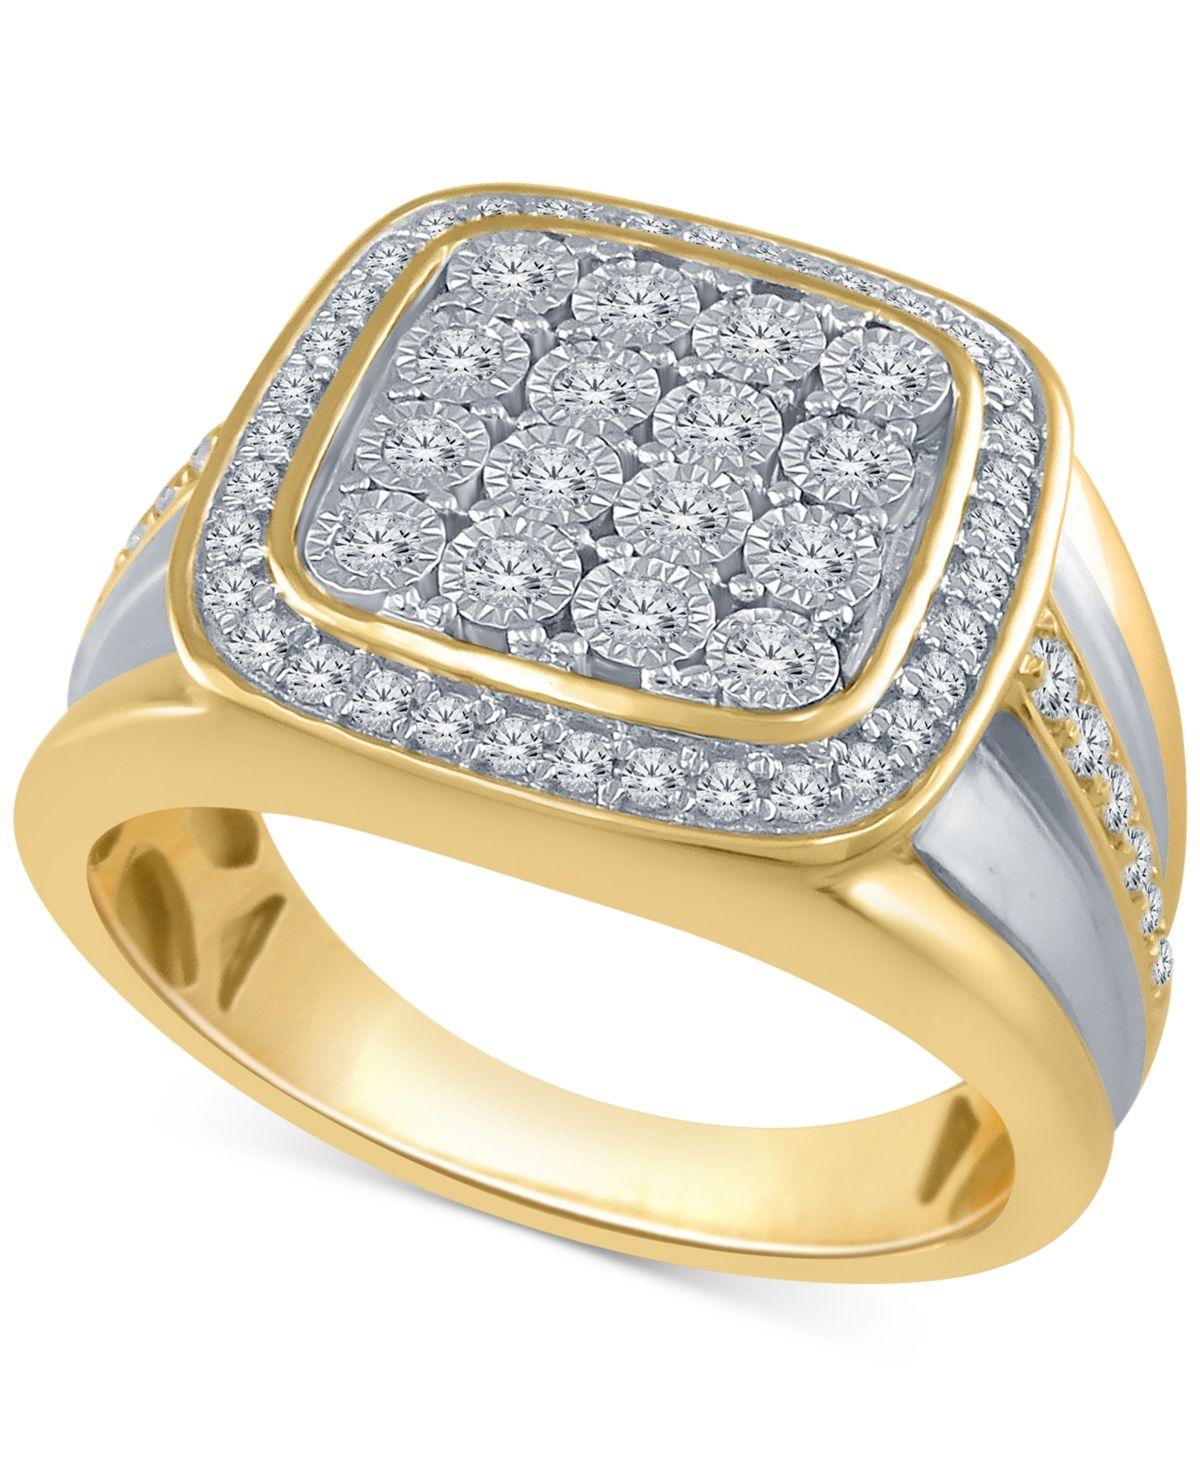 Macy's Men's Diamond TwoTone Cluster Ring (1/2 ct. t.w